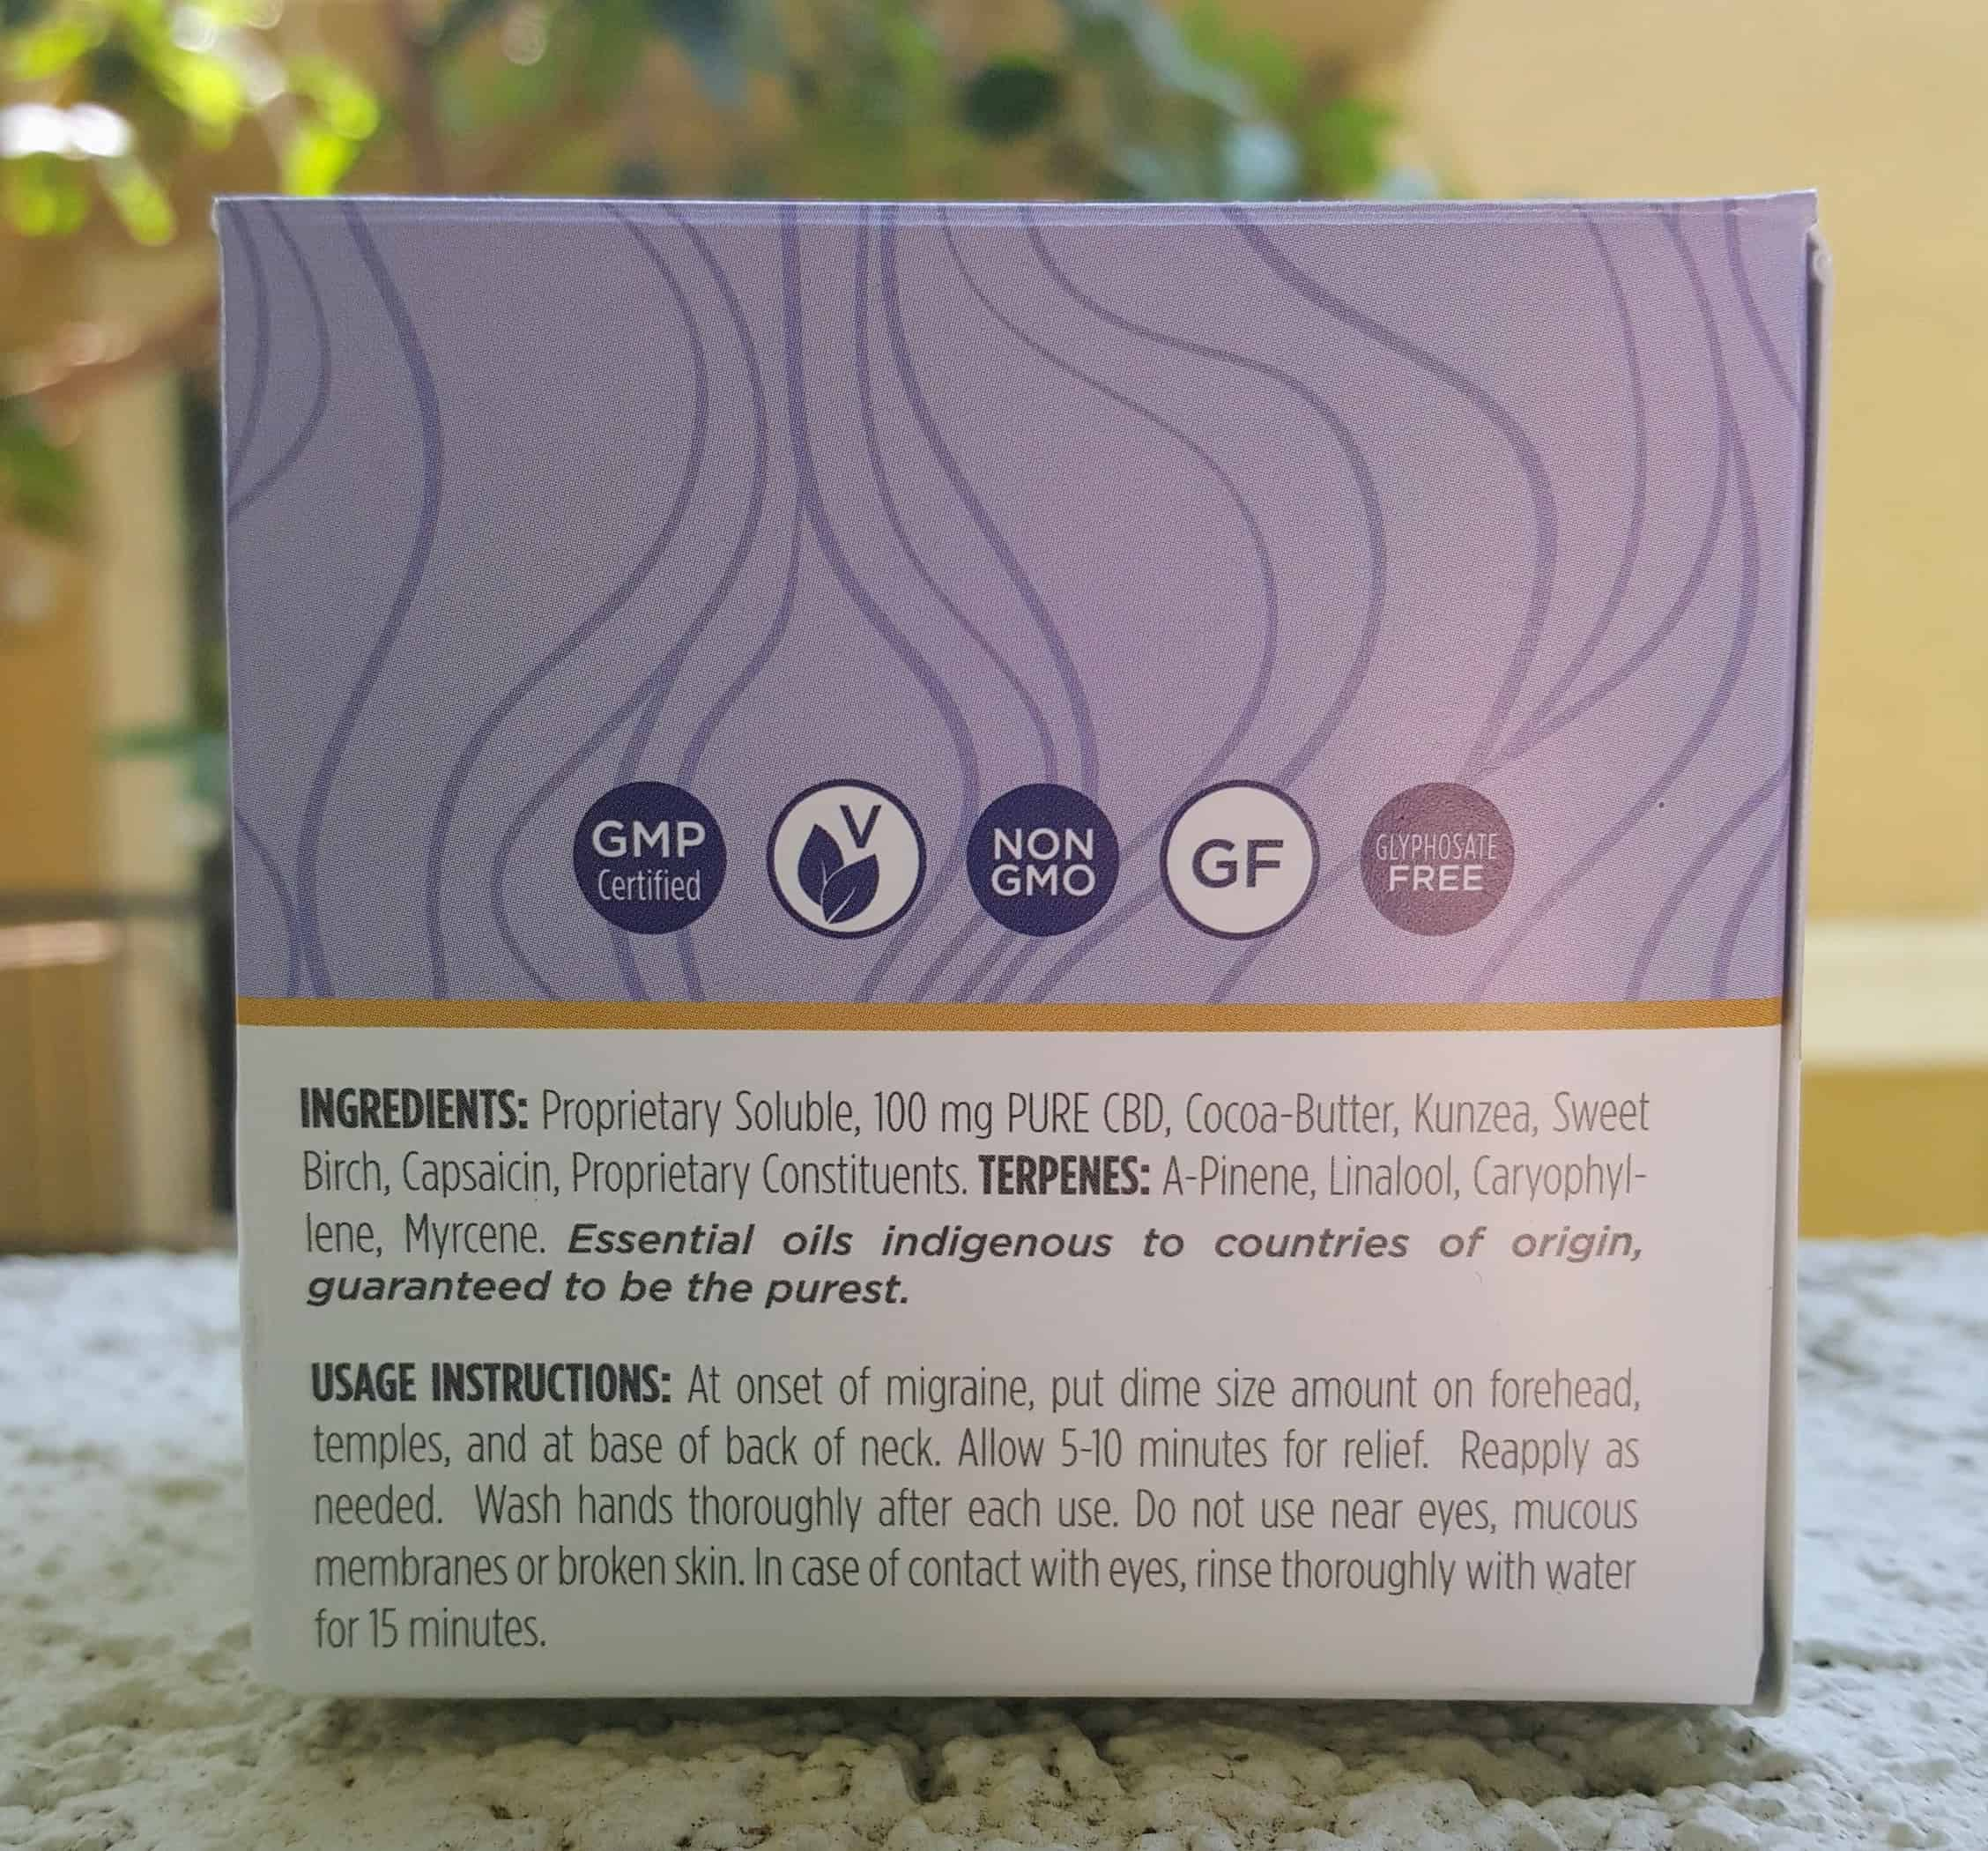 CBD Tru Review Migraine Salve Save On Cannabis Specification